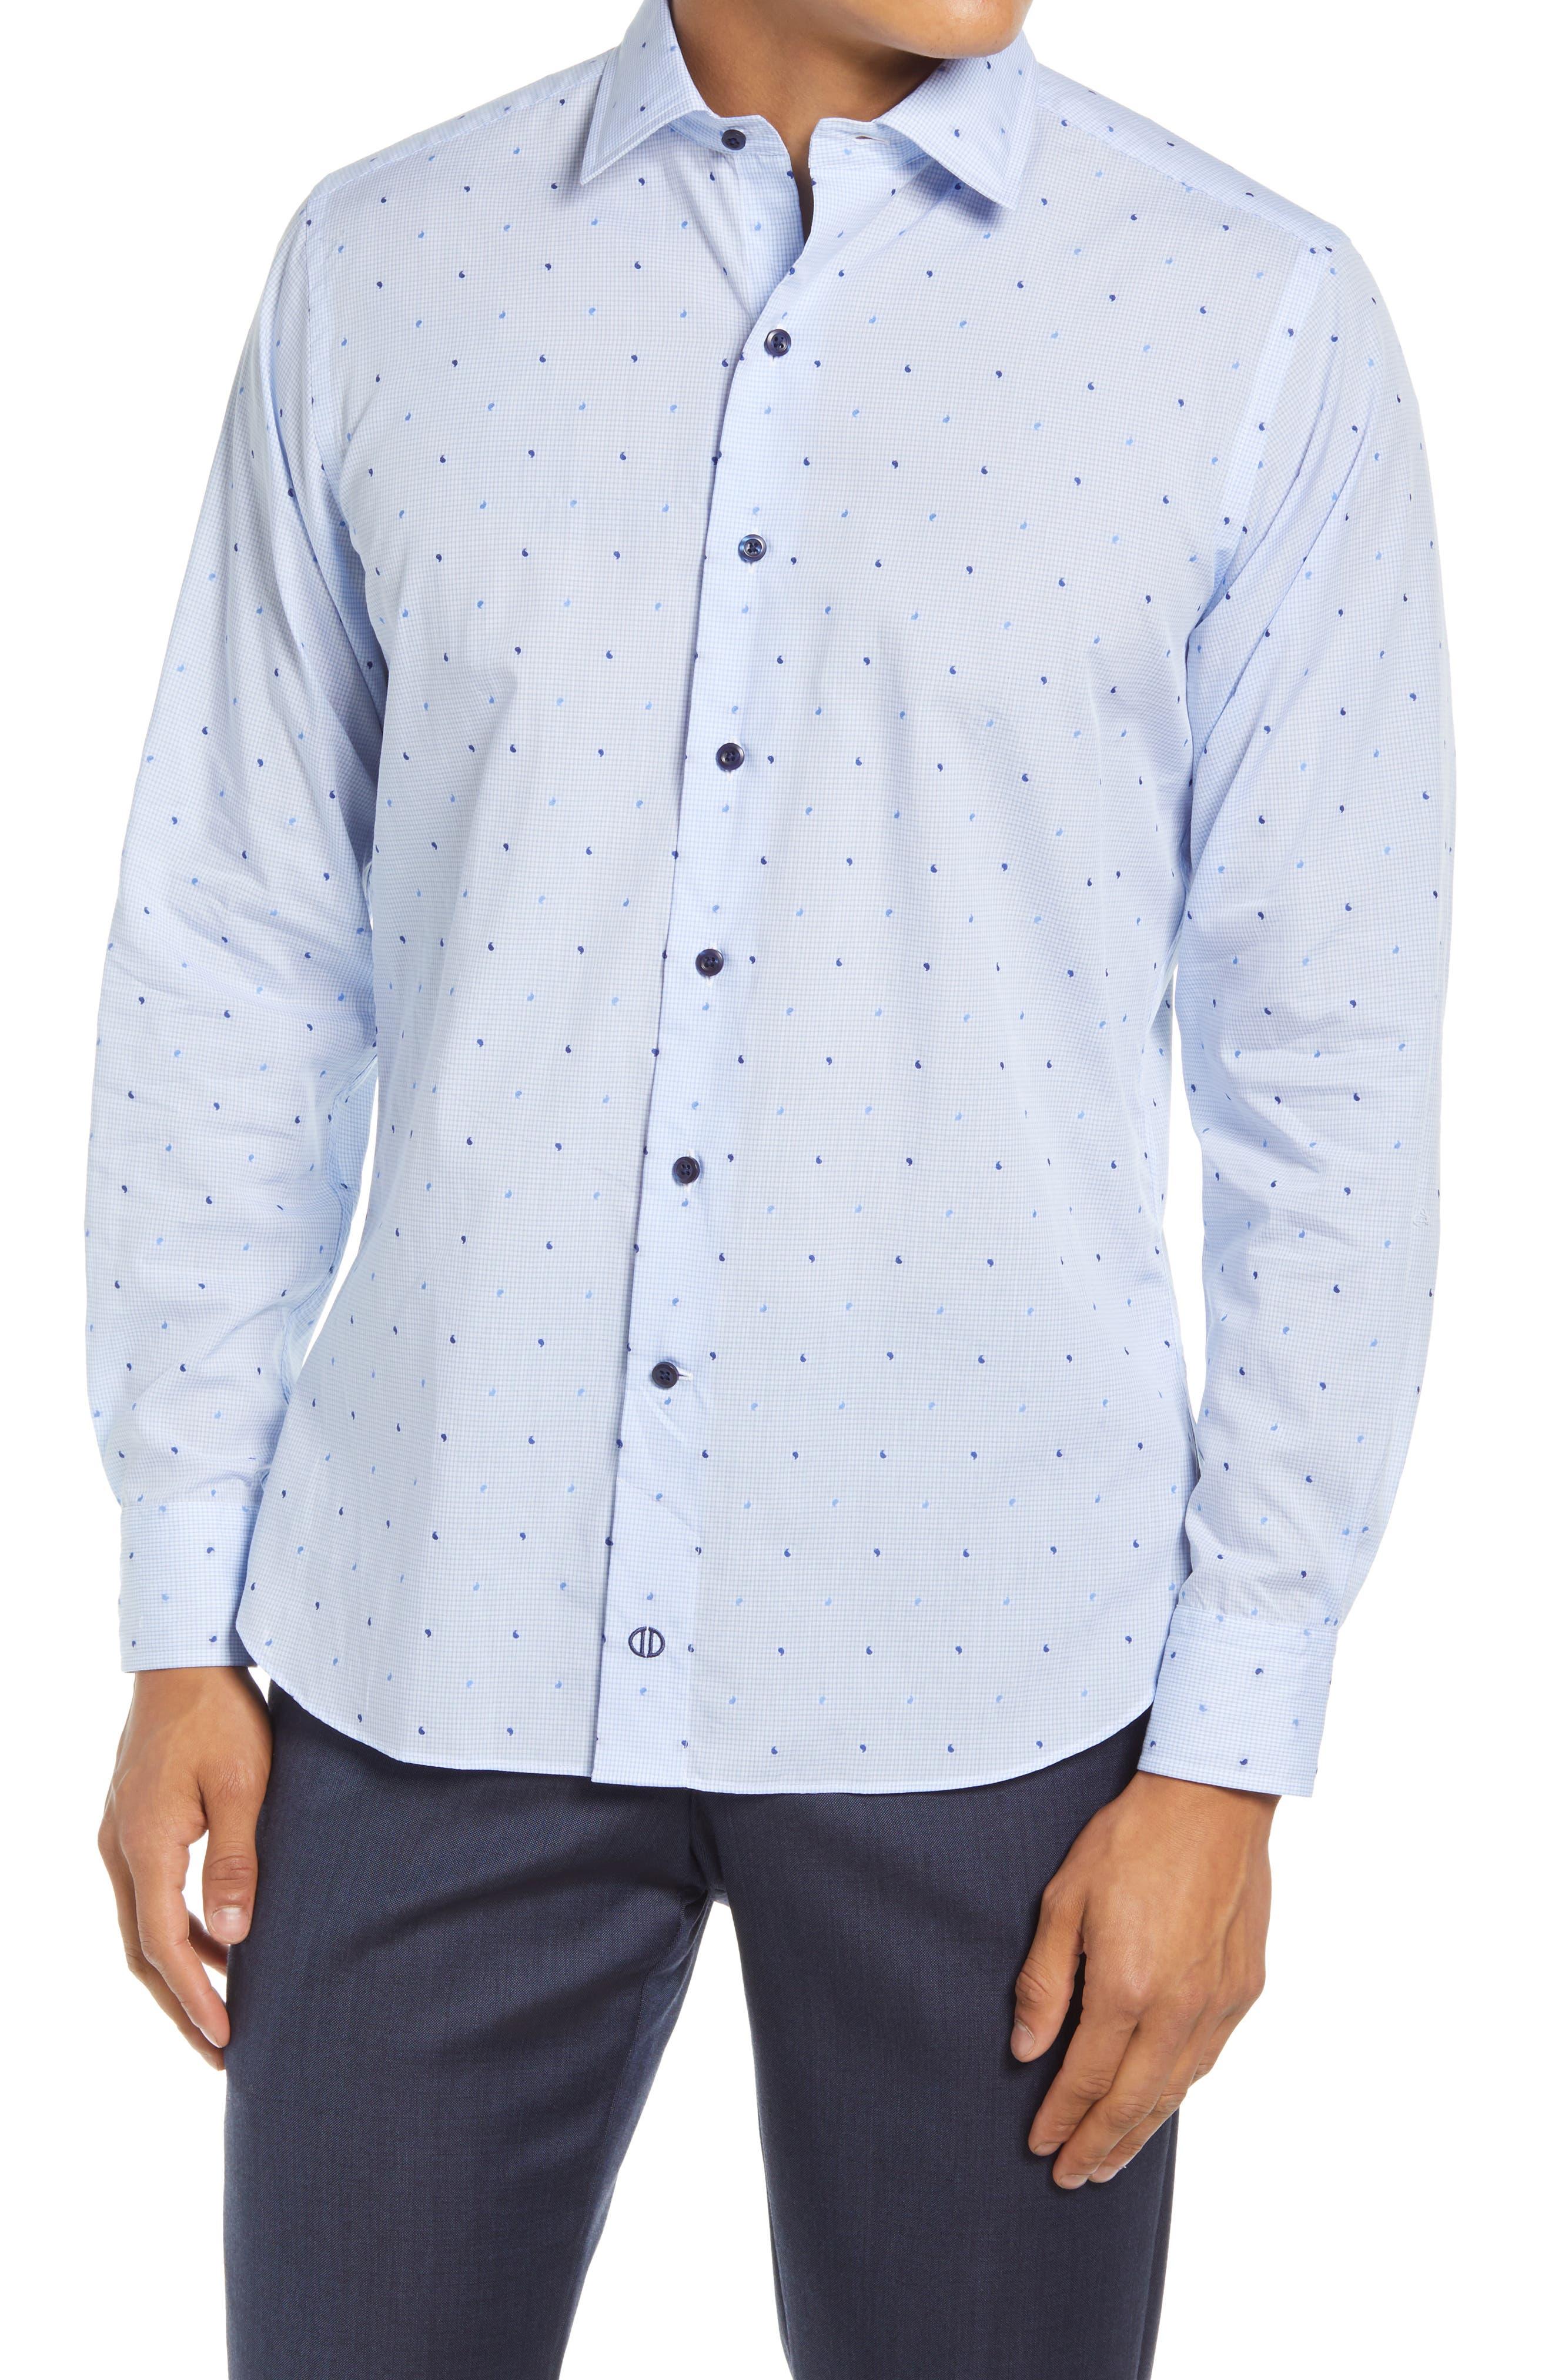 Trim Fit Plaid Embroidered Dress Shirt